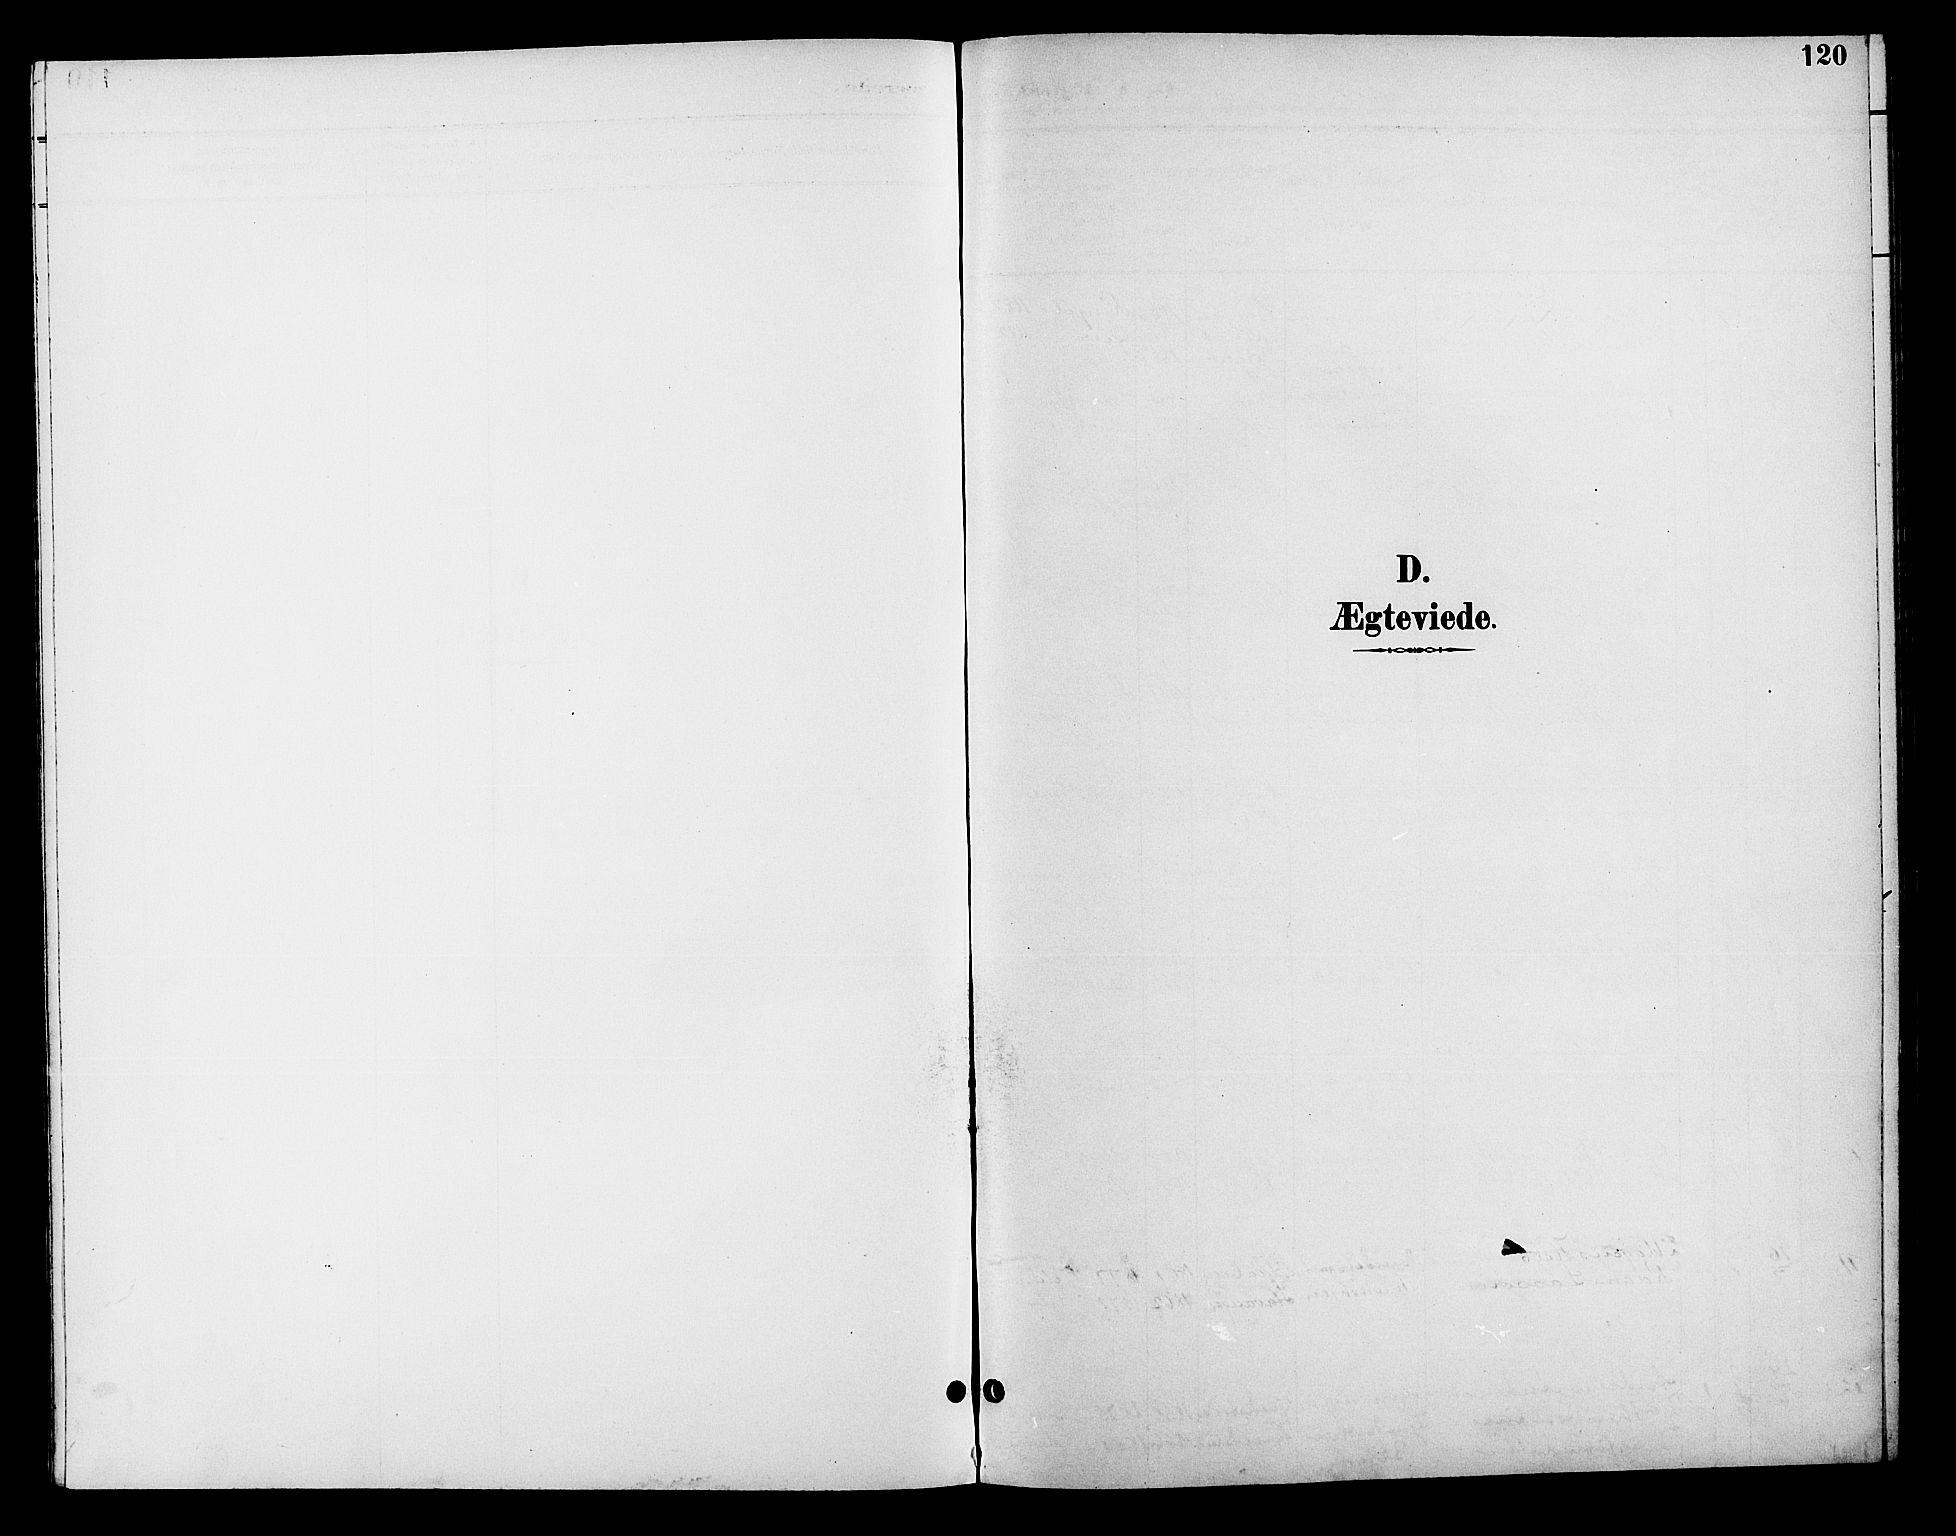 SAH, Fåberg prestekontor, Klokkerbok nr. 8, 1891-1900, s. 120